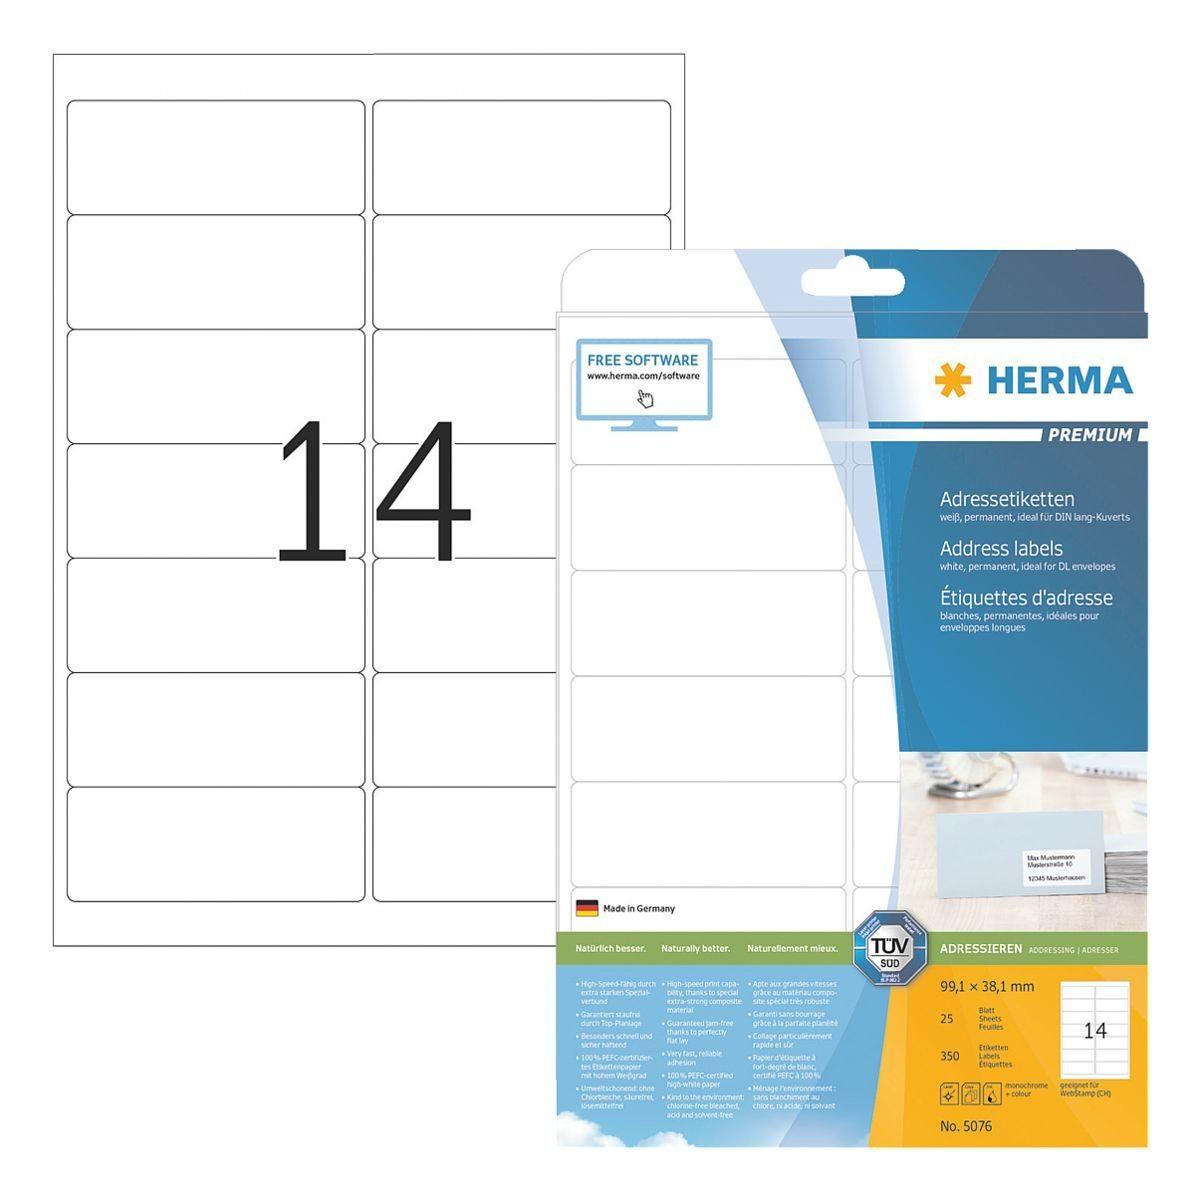 HERMA 350er-Pack Klebeetiketten »PREMIUM«